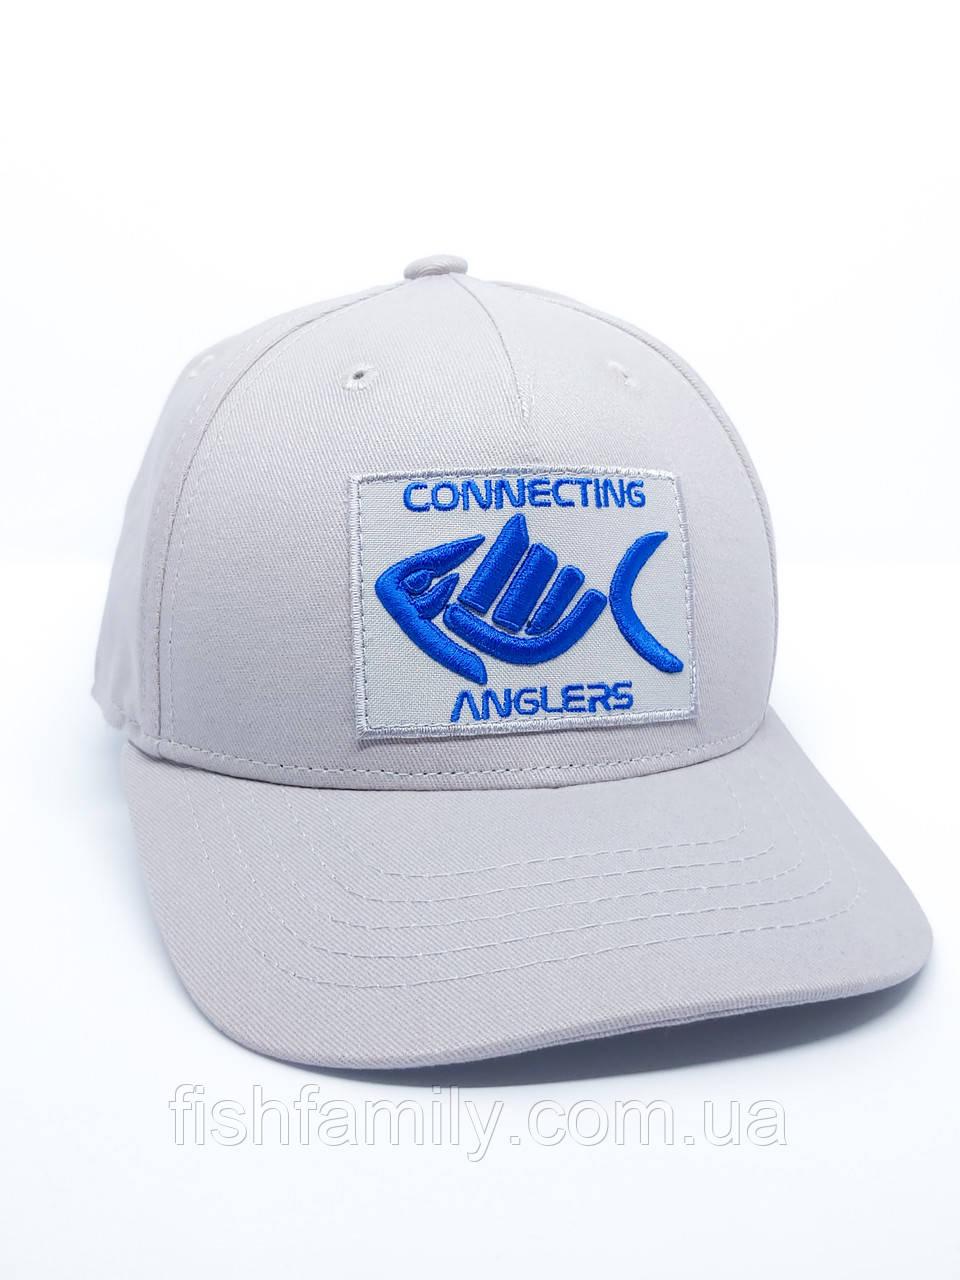 Бейсболка Connecting Anglers White